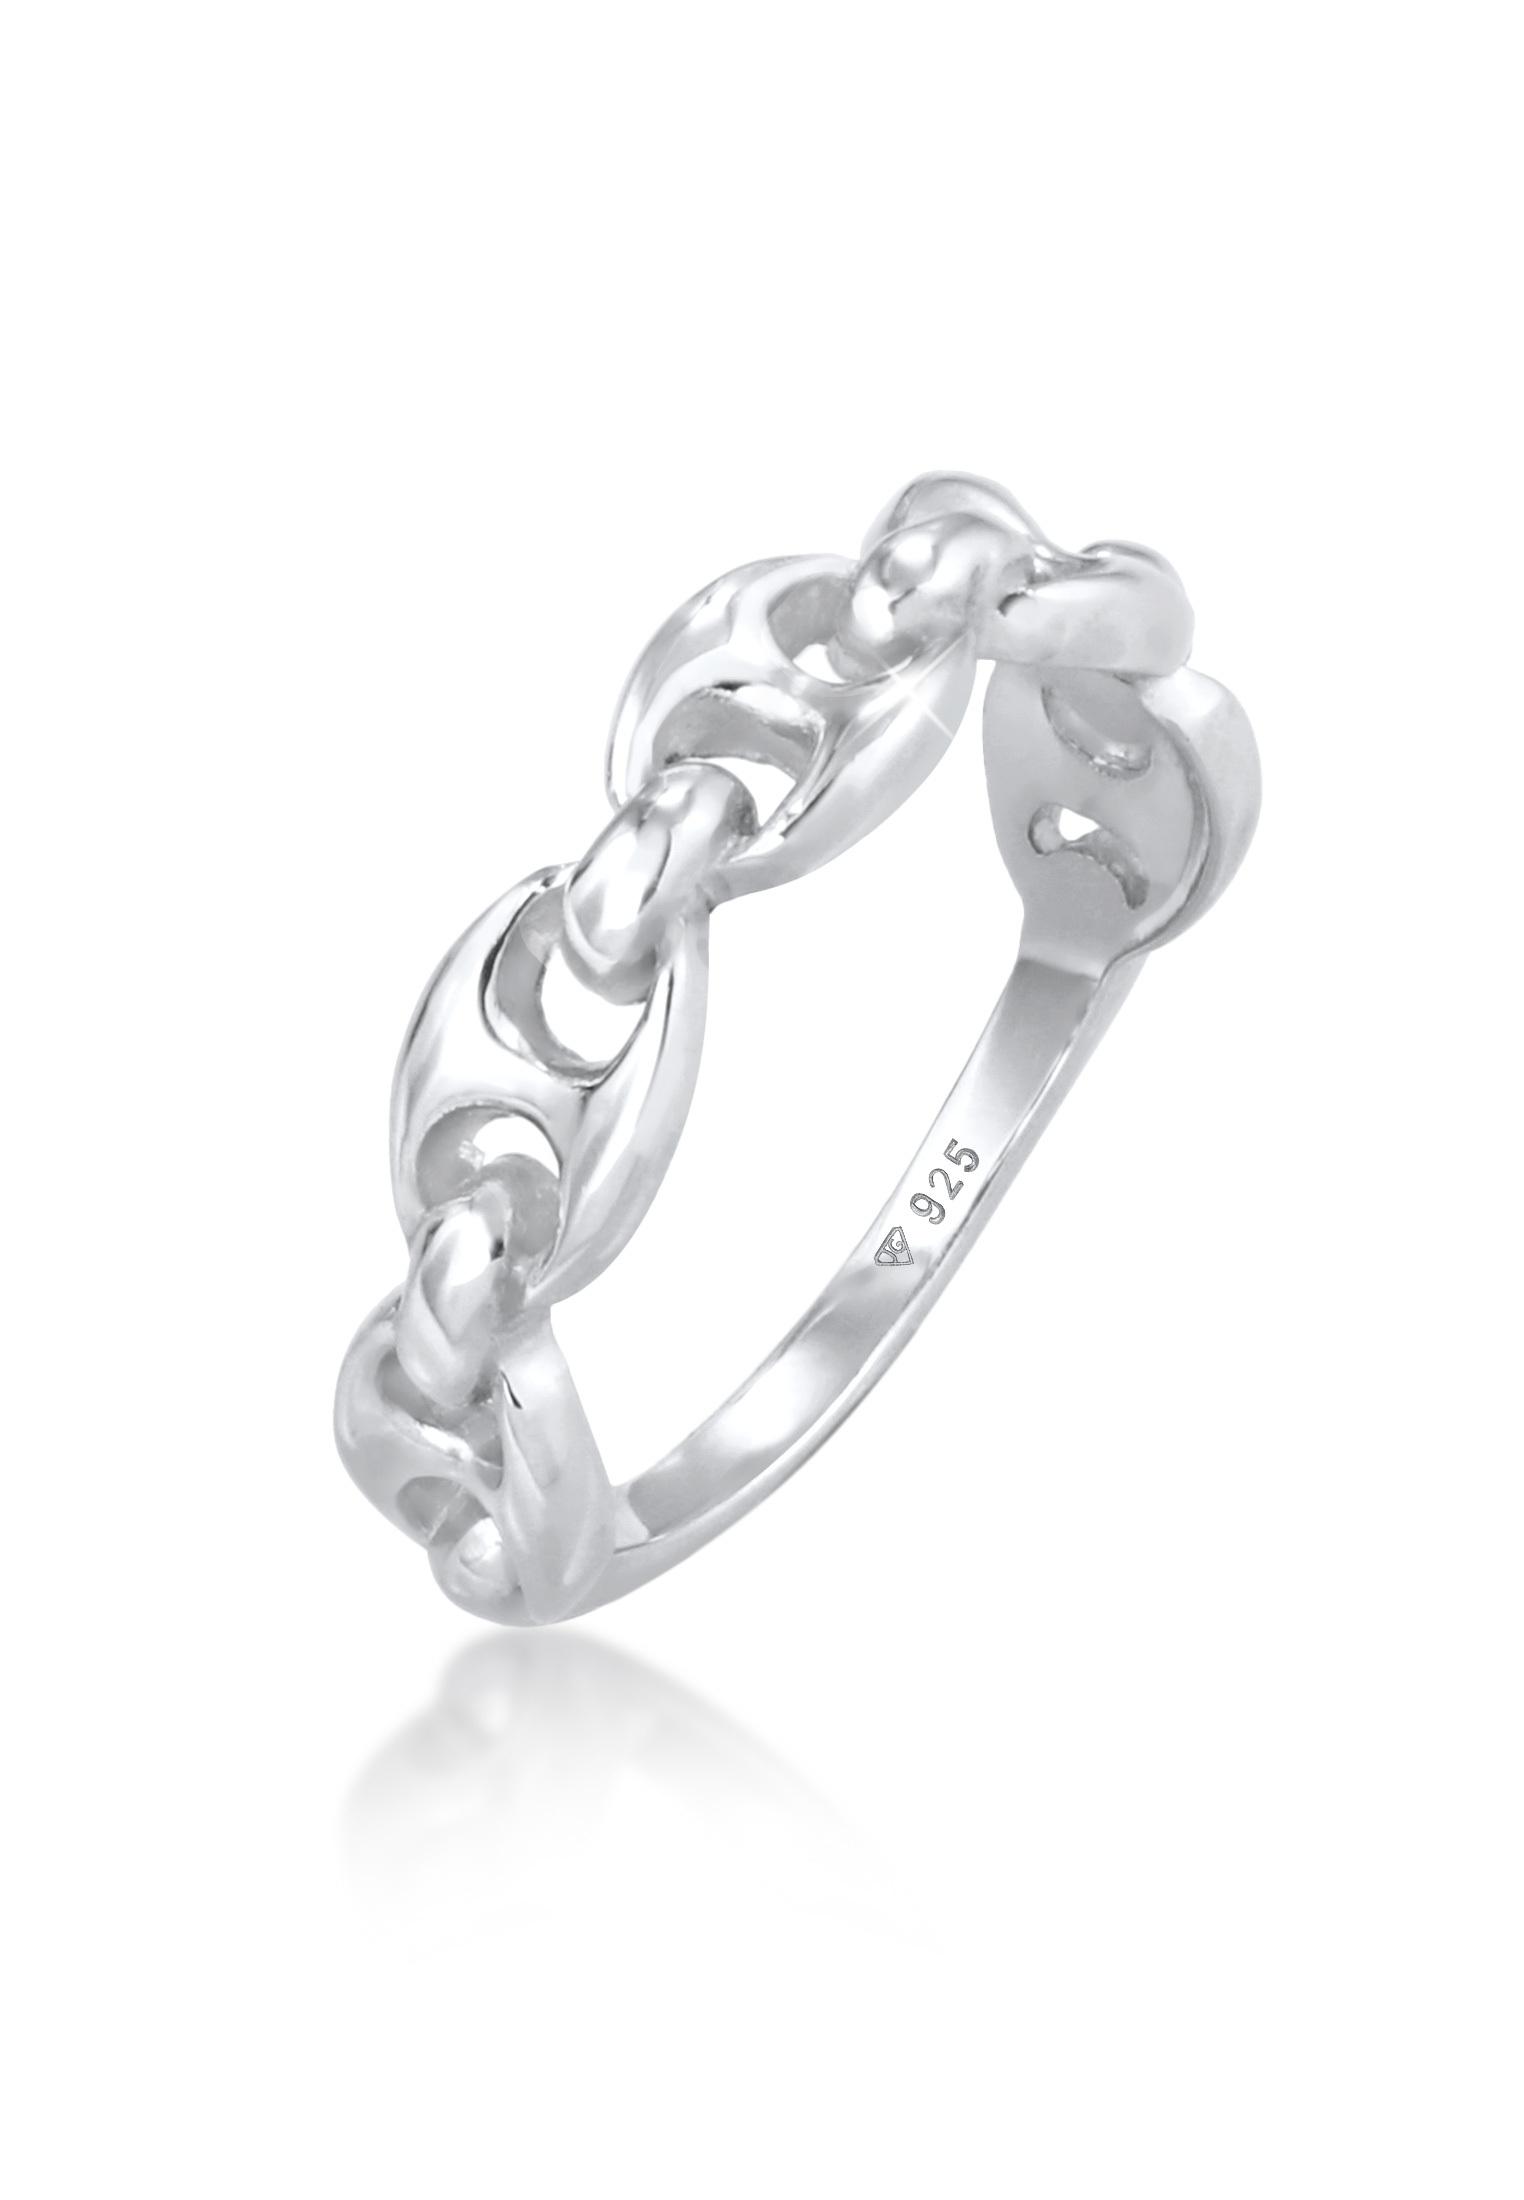 Ring Schiffsankerglieder   925er Sterling Silber